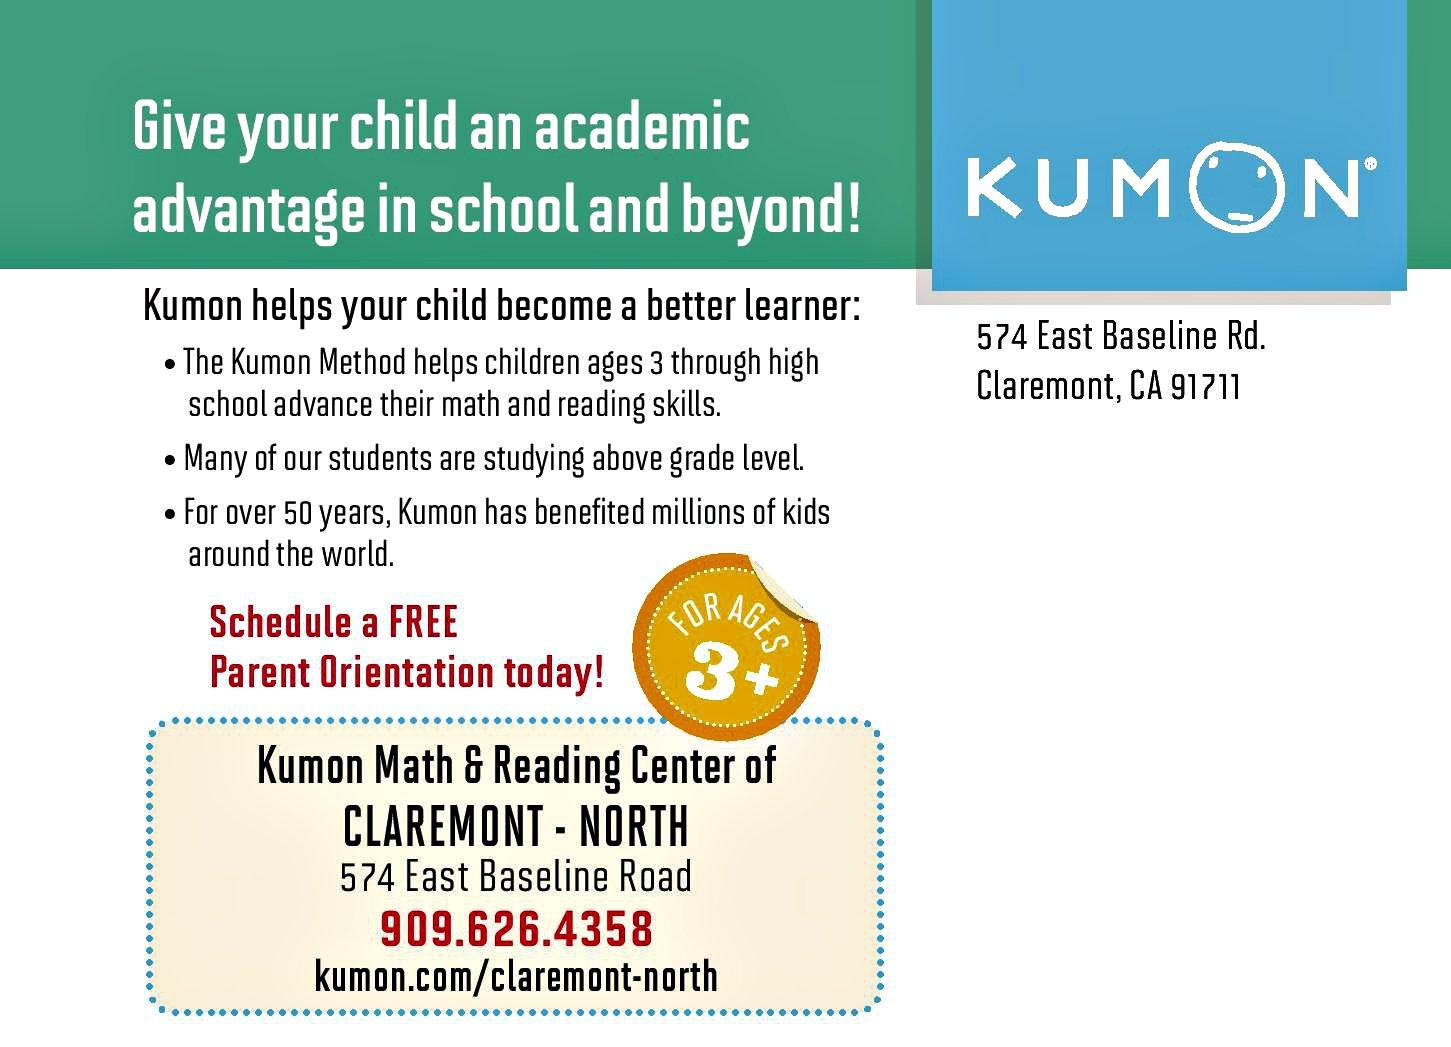 Kumon Math and Reading Center of Claremont-North | Macaroni Kid